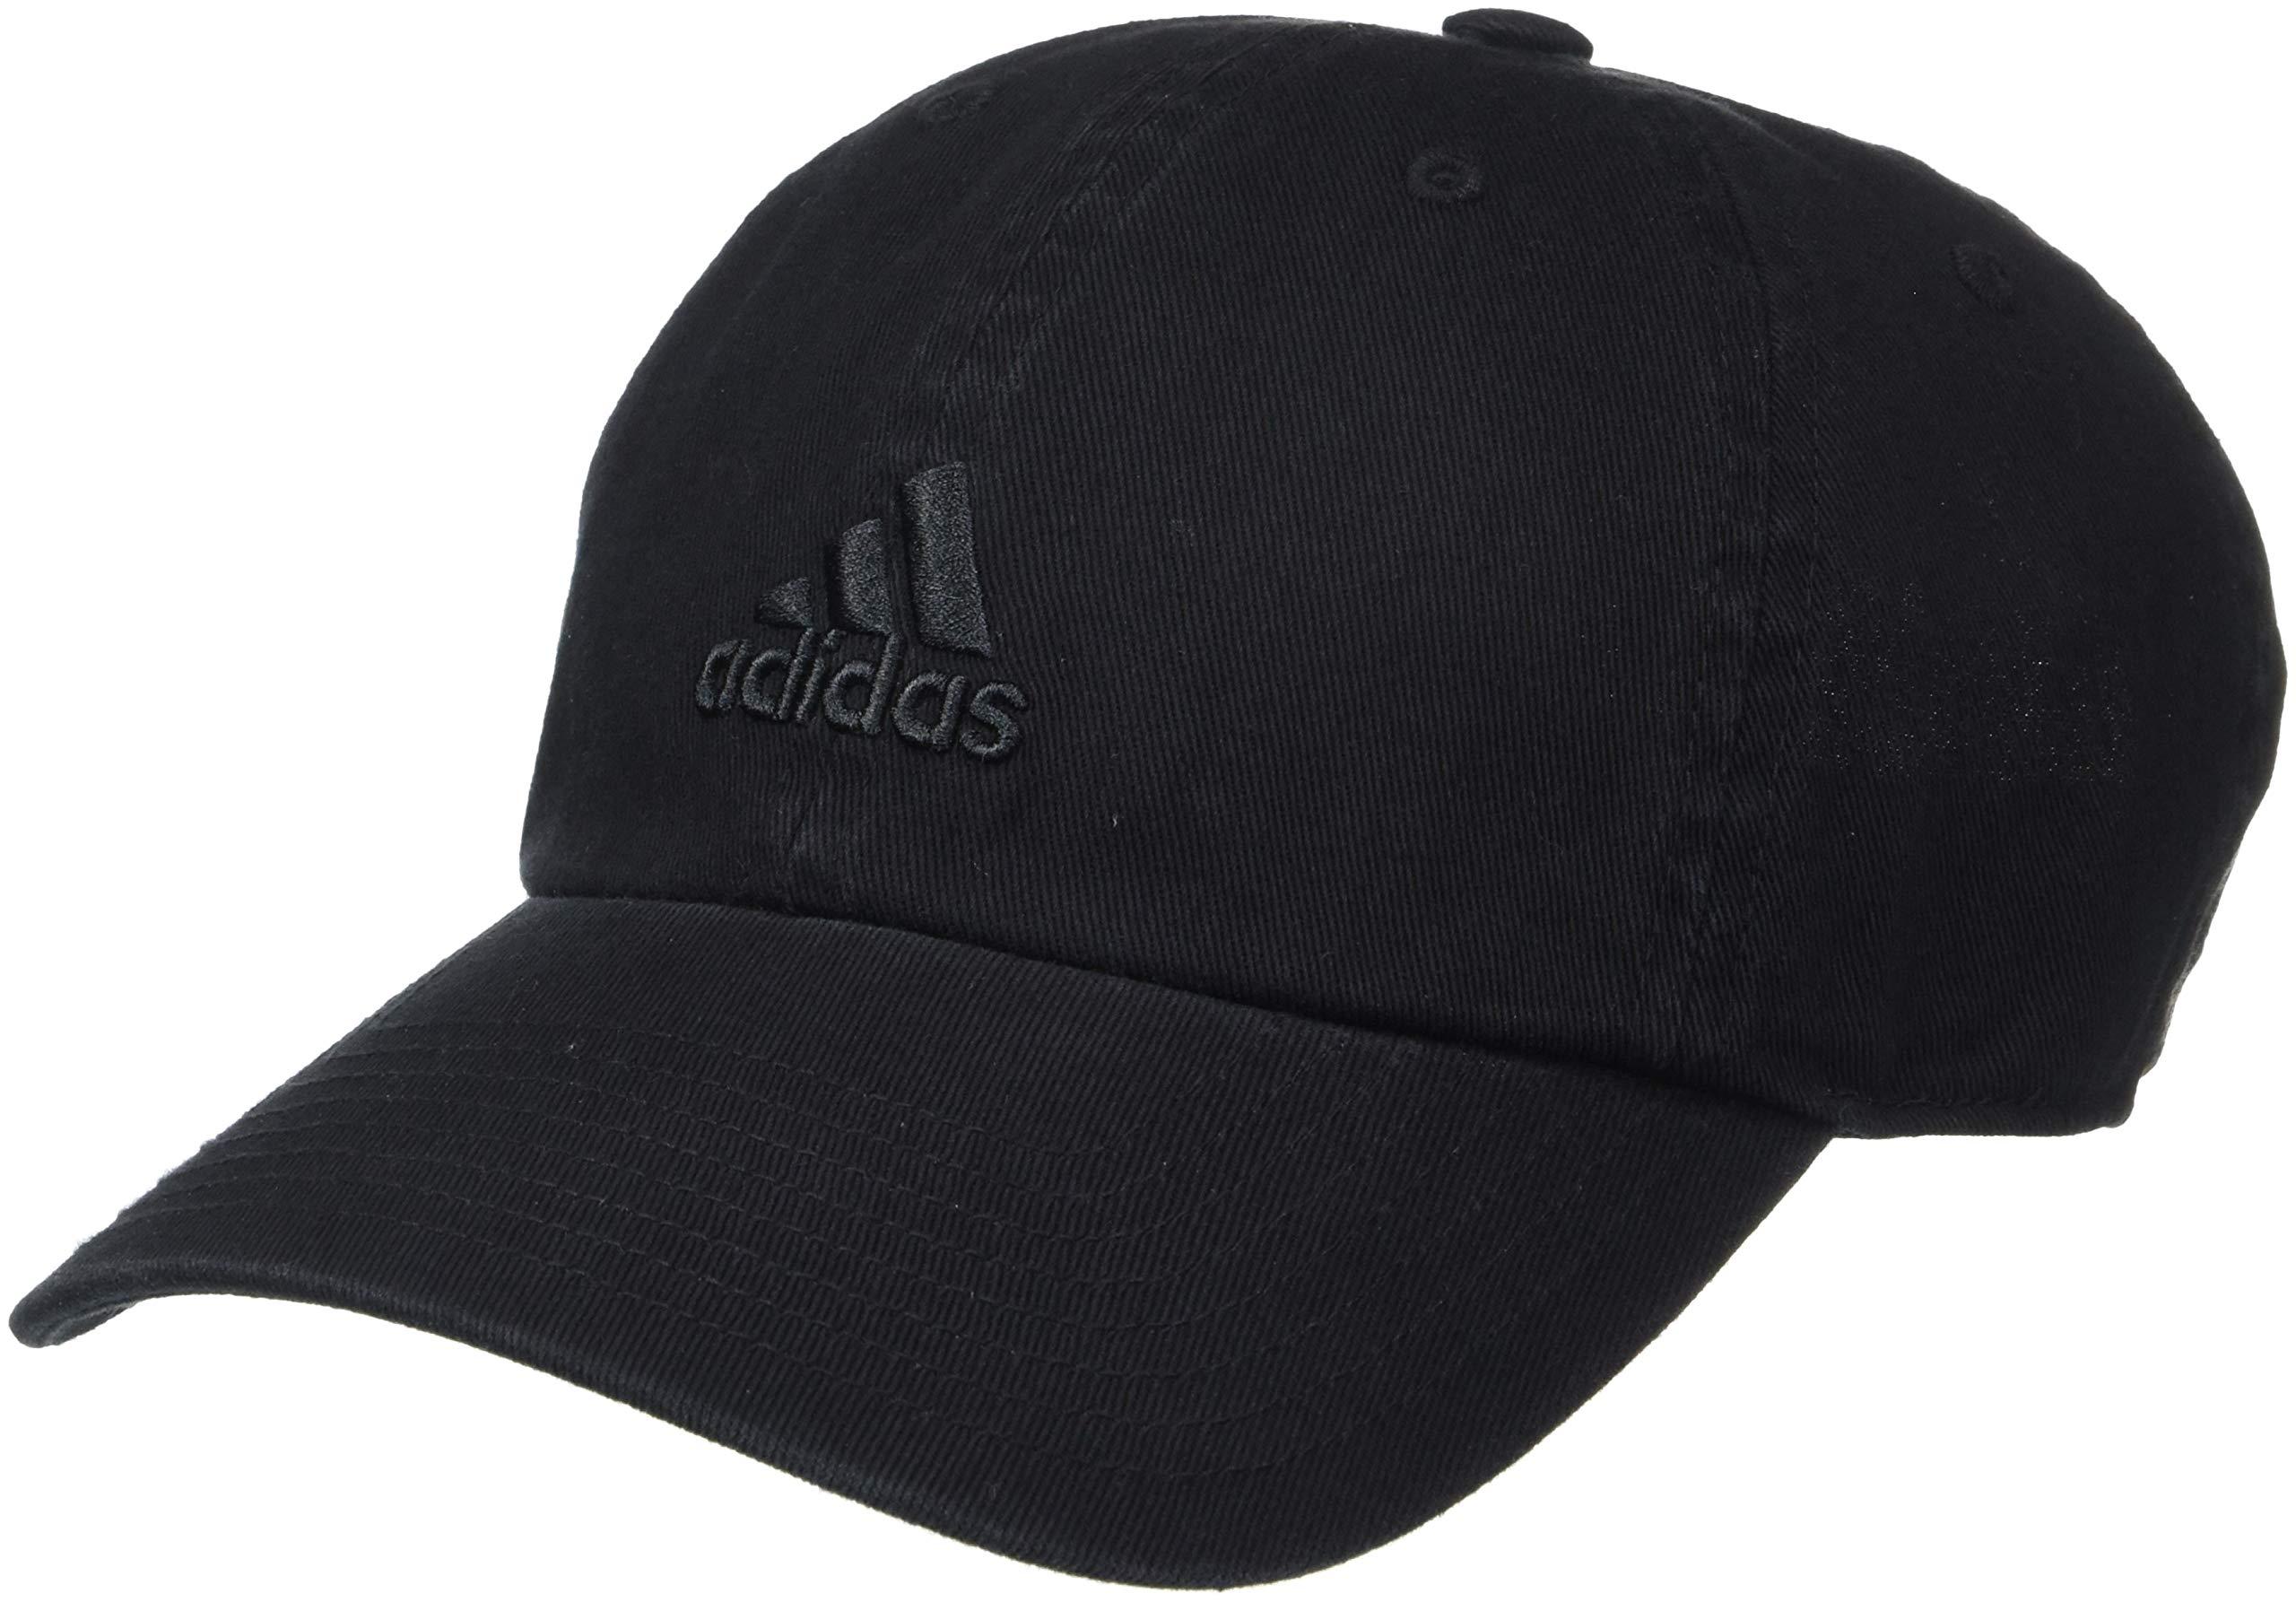 adidas Women's Saturday Cap, Black/Black, ONE SIZE by adidas